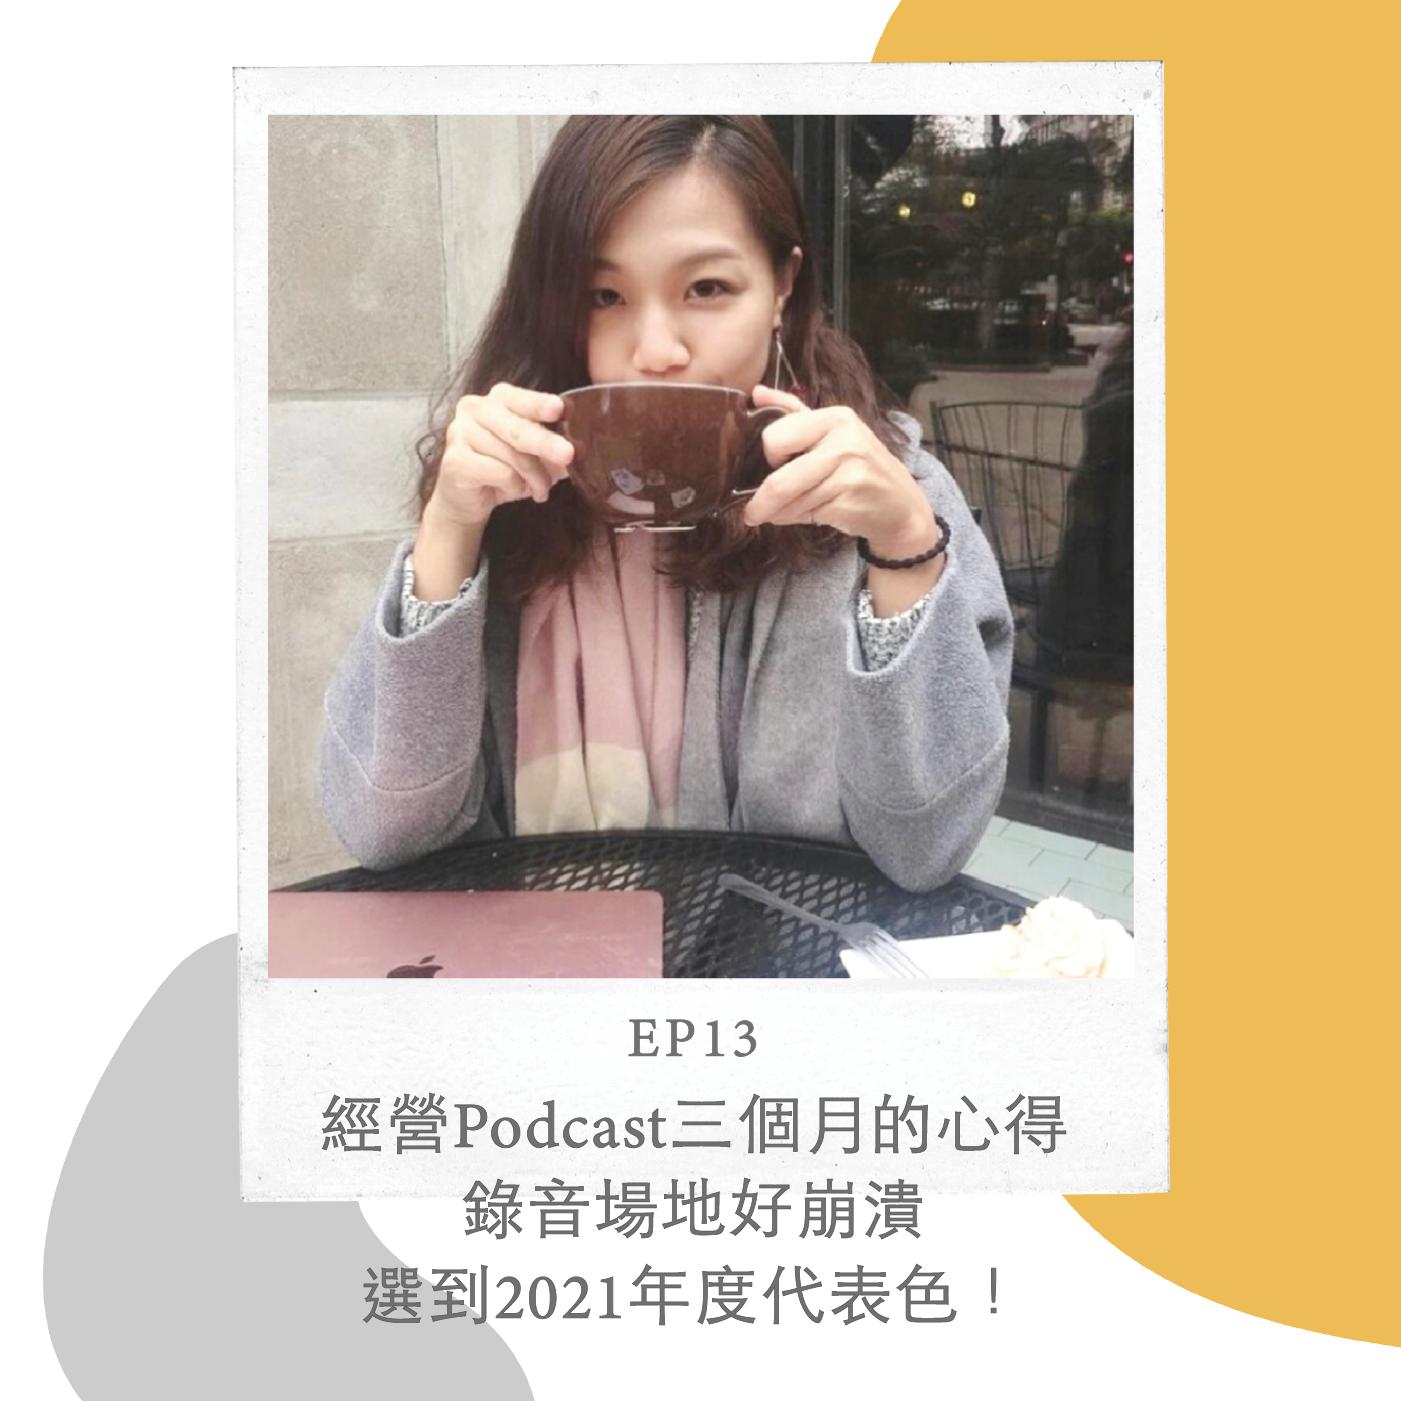 EP13 經營Podcast三個月的心得 錄音場地好崩潰 選到2021年度代表色!